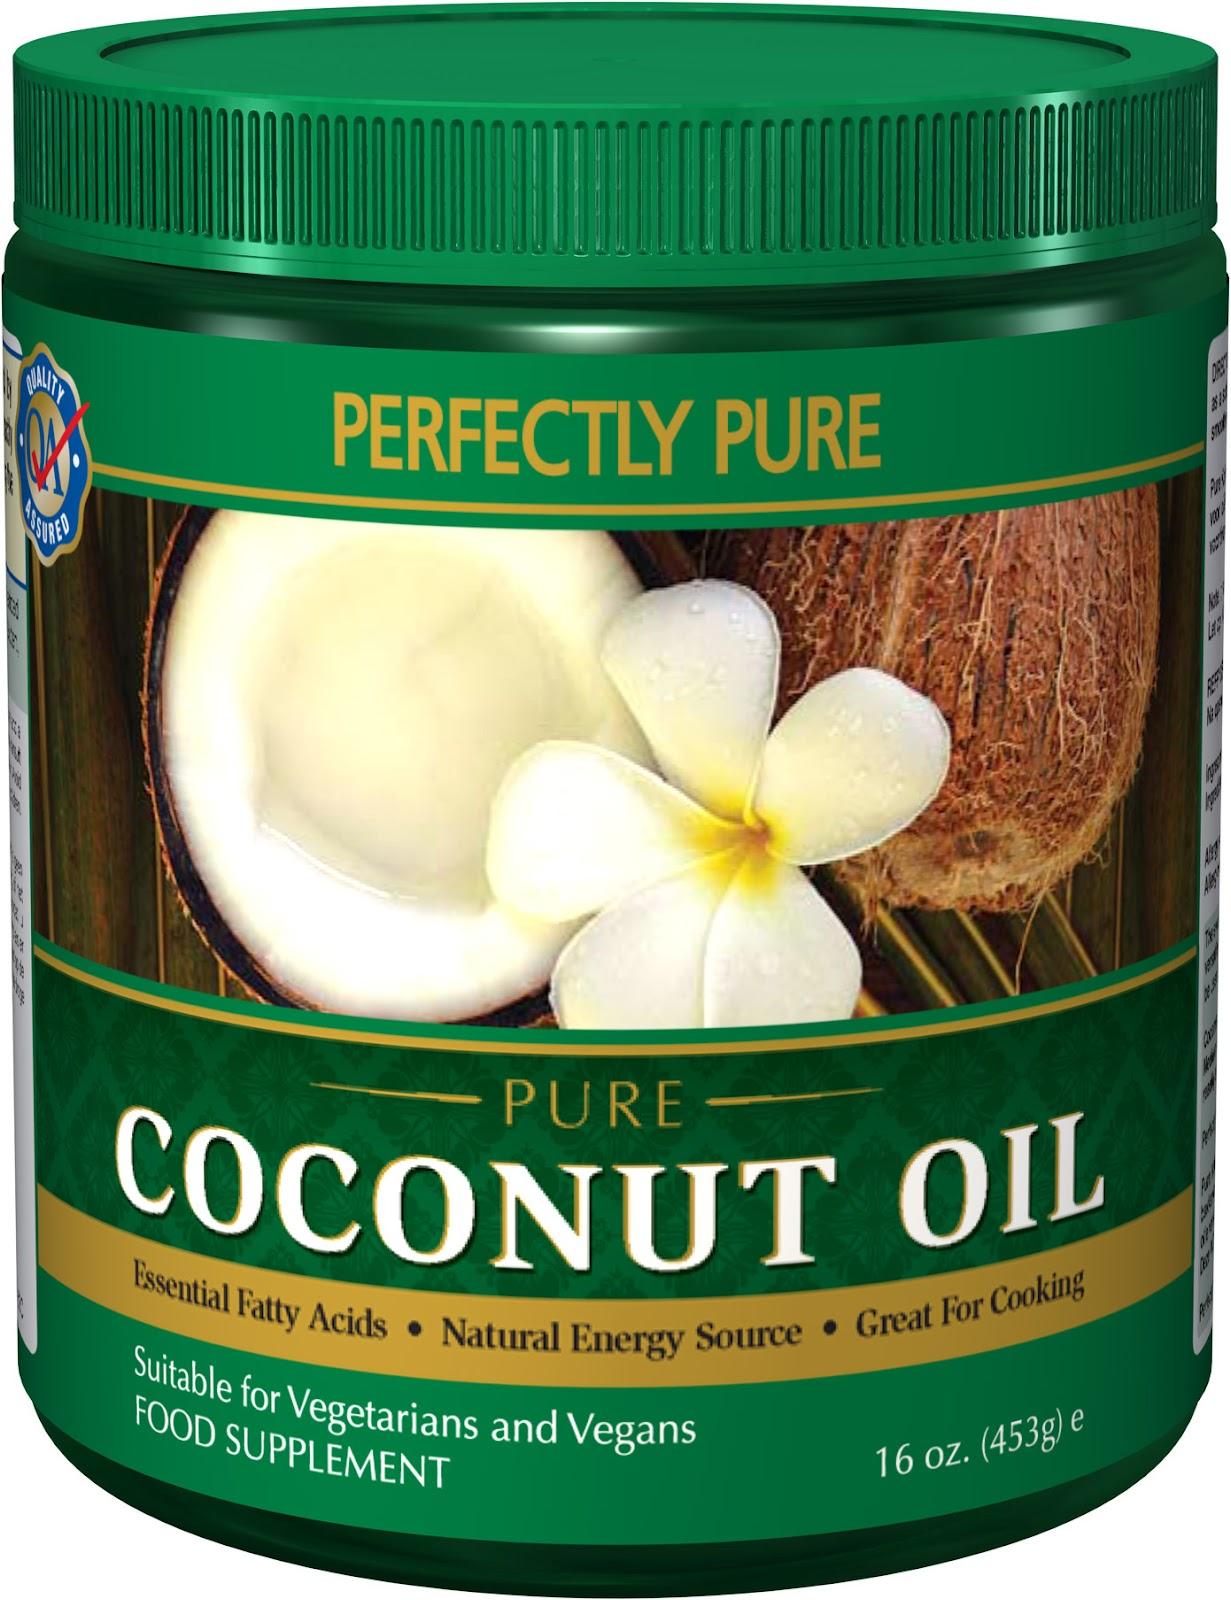 http://4.bp.blogspot.com/-YeibX2au9_Q/T48fvNTTNOI/AAAAAAAABIY/InaDl5y4VW0/s1600/Coconut+Oil.jpg